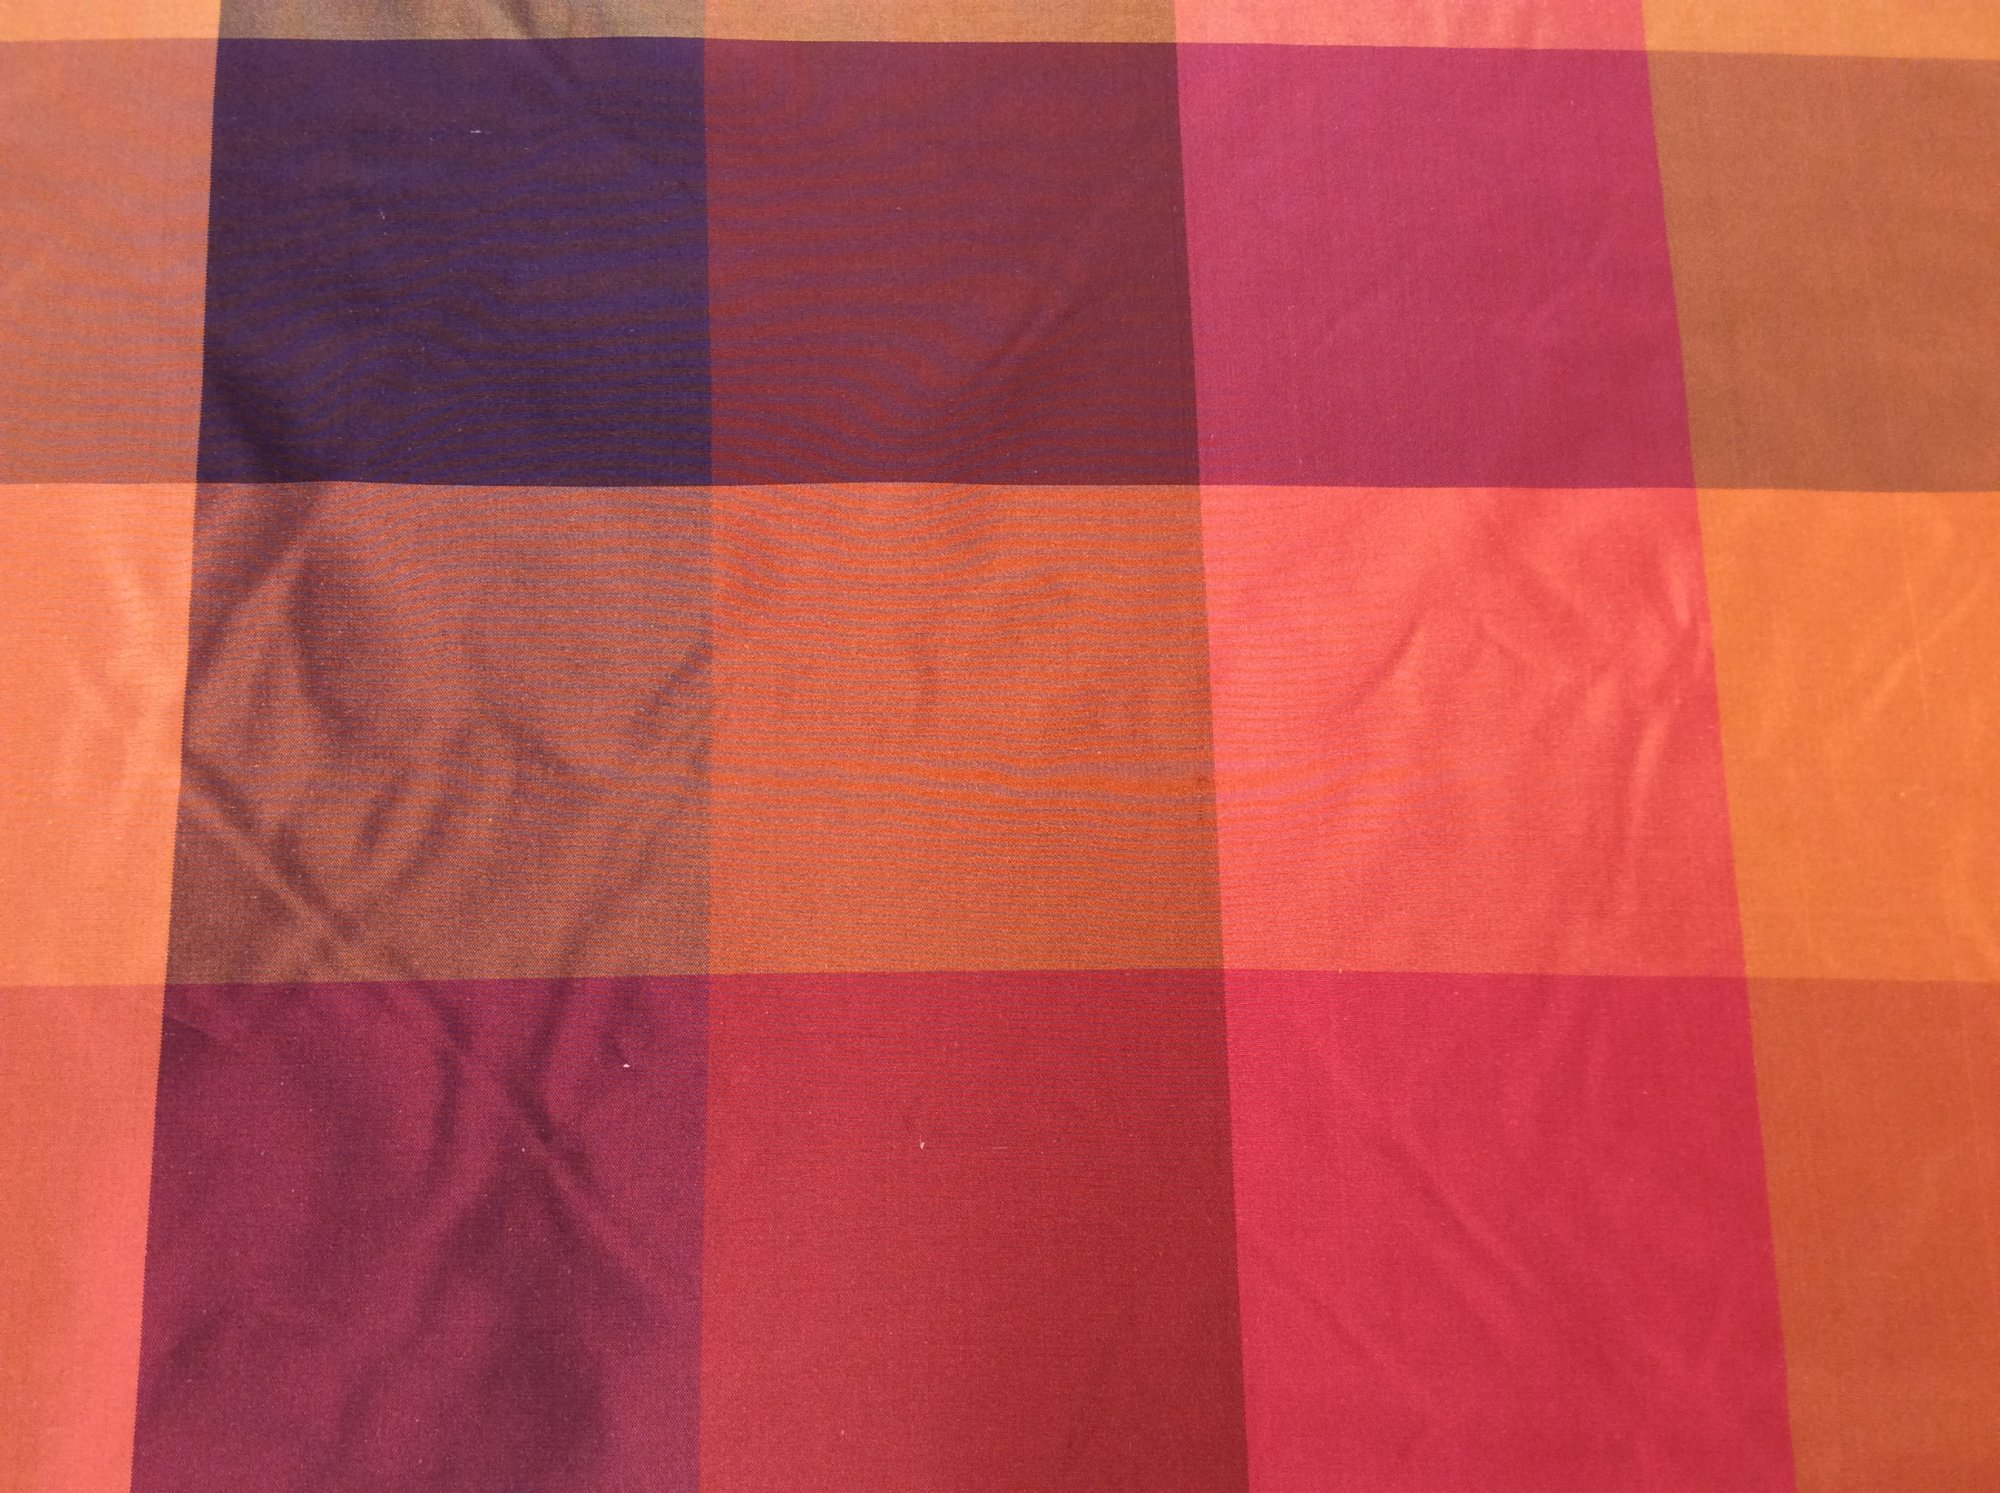 100% Silk Taffeta Autumn Tuscan Buffalo Check Plaid Drapery Apparel Fabric FM105